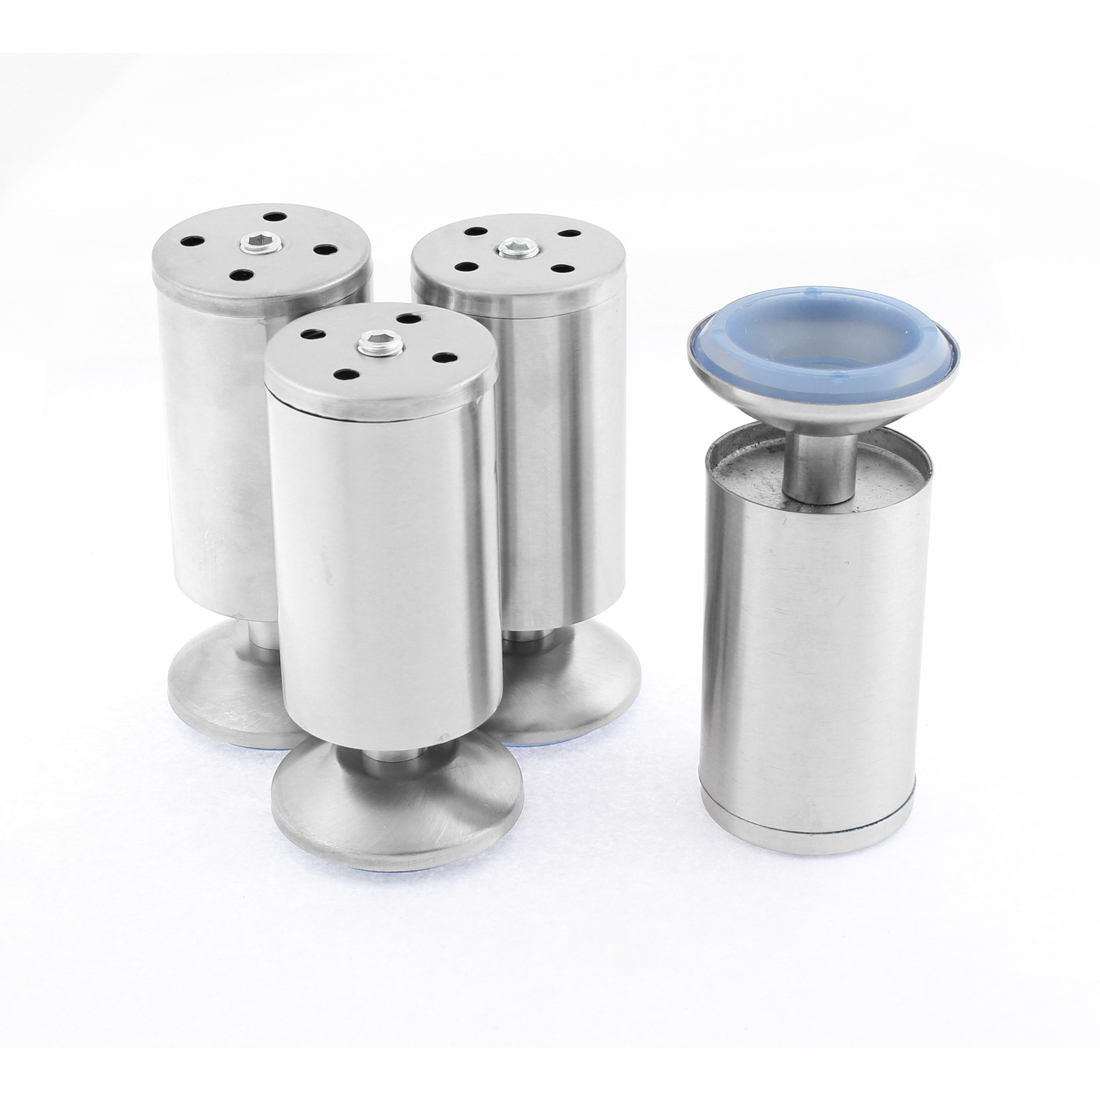 Cabinet Sofa Adjustable Leg Feet Cylinder Stand 50 x 120mm 4PCS